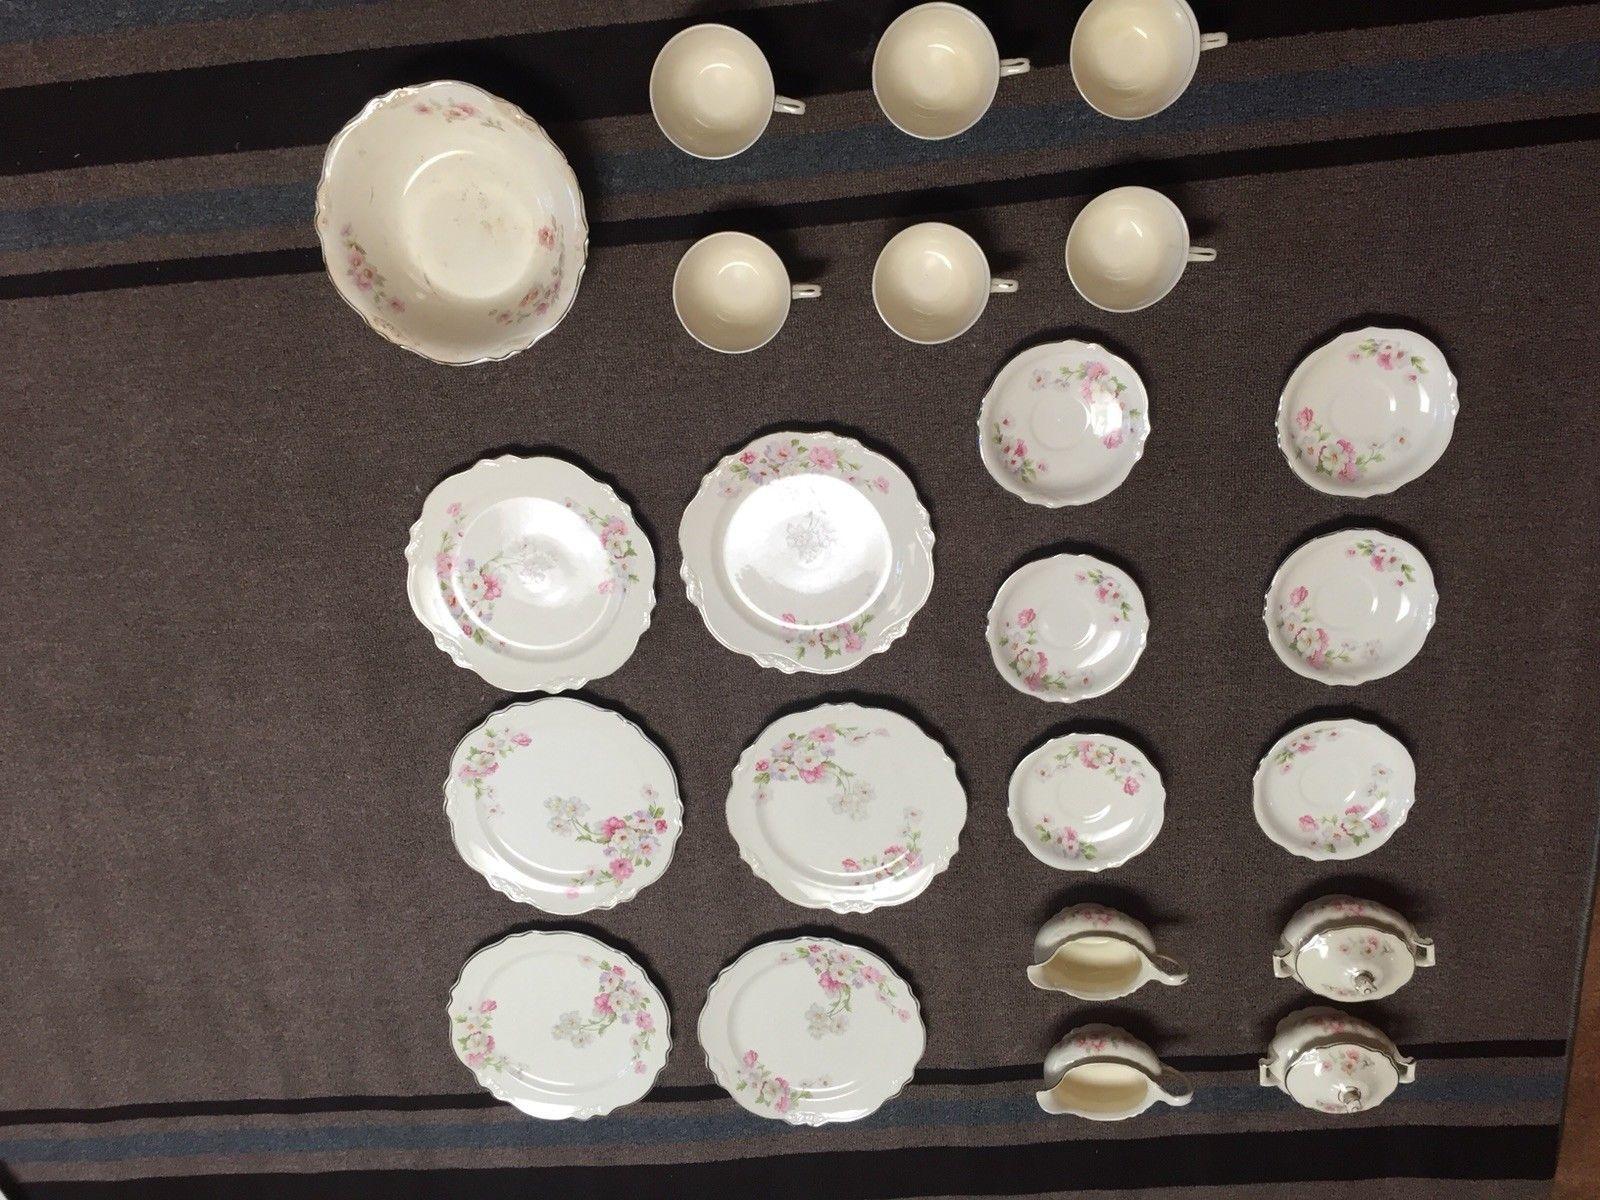 HOMER LAUGHLIN A46N8 Vintage China 24 set for 6 with 2 cream & Sugars & Big Bowl